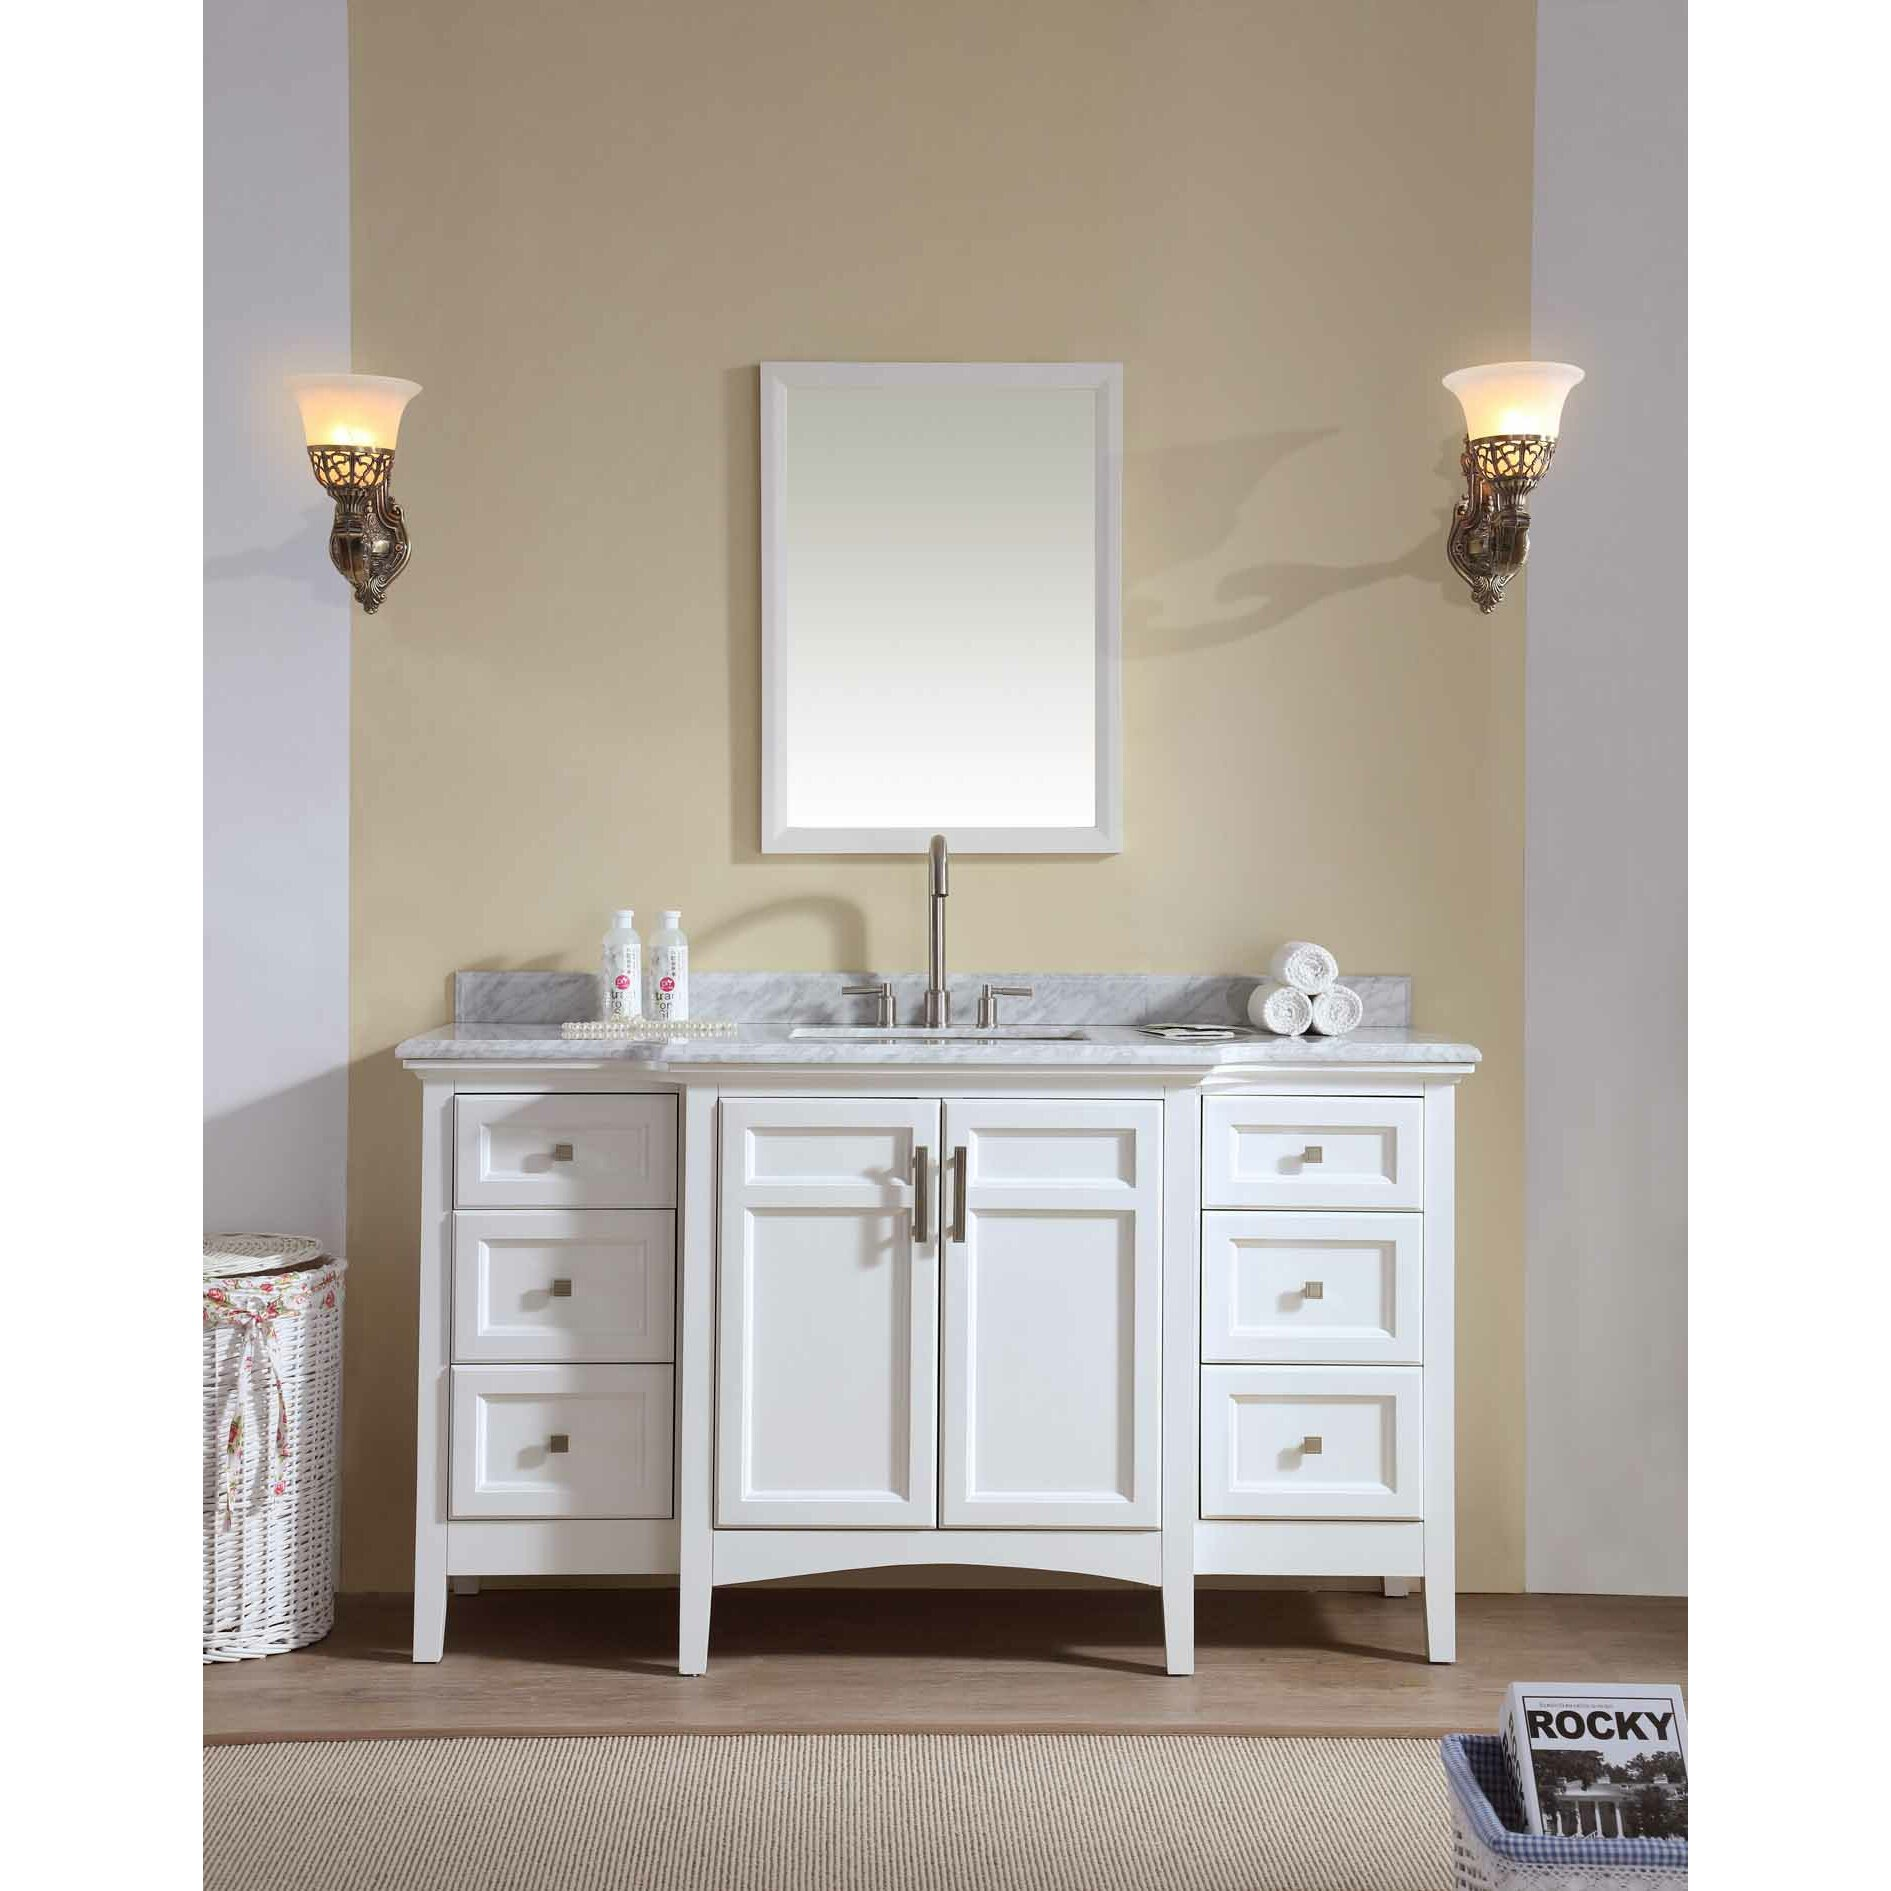 Ari kitchen bath luz 60 single bathroom vanity set for Bathroom vanity sets for sale